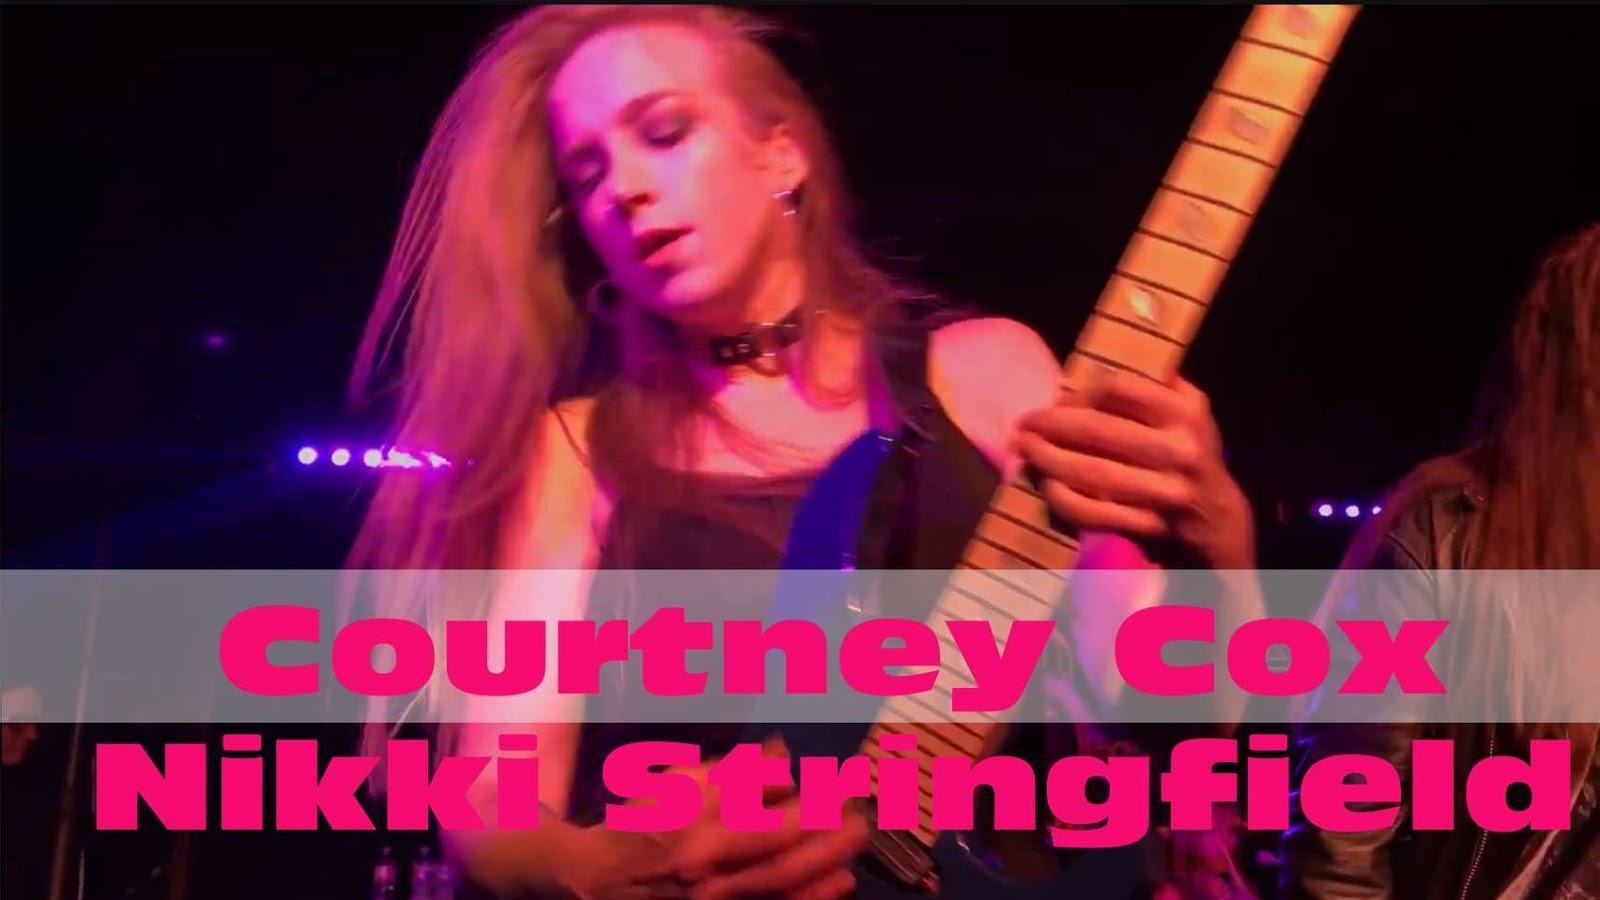 Courtney Cox, Nikki Stringfield: The Iron Maidens - recent show performances